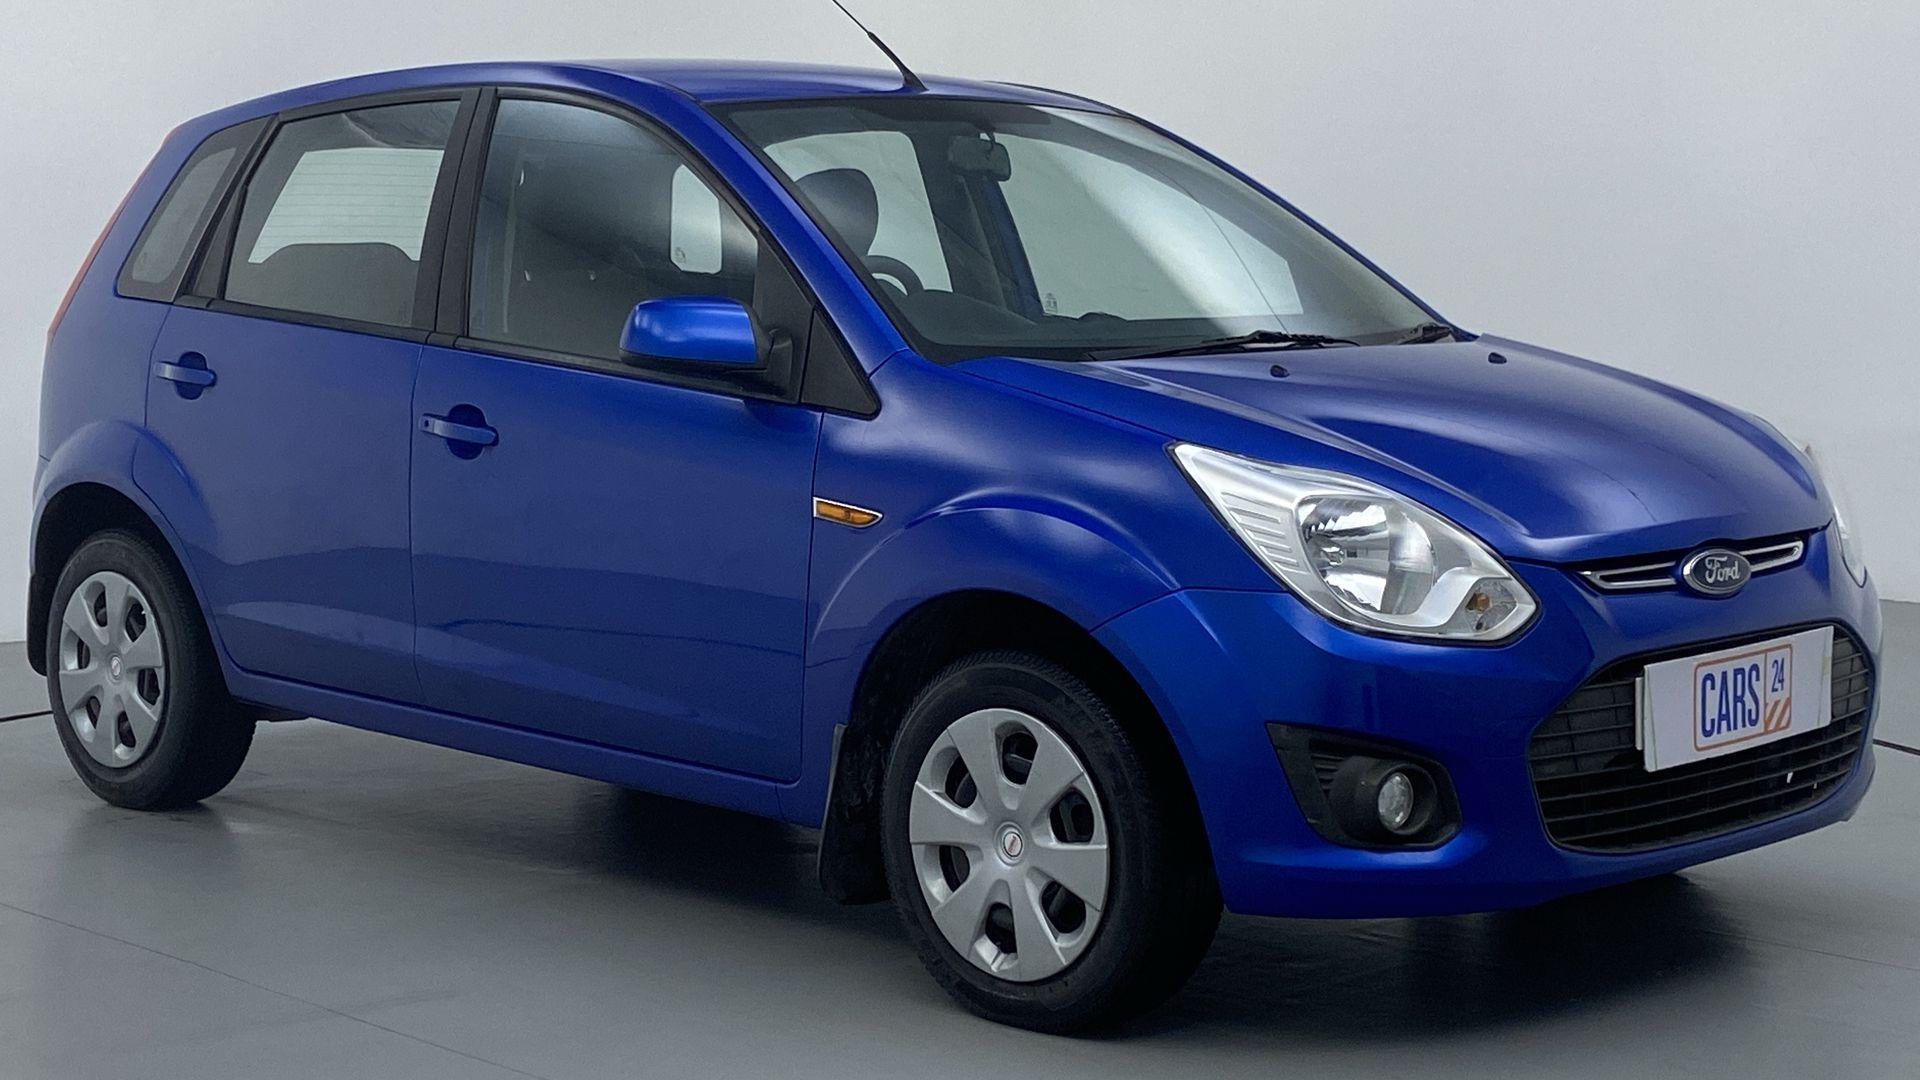 2013 Ford Figo 1.2 ZXI DURATEC